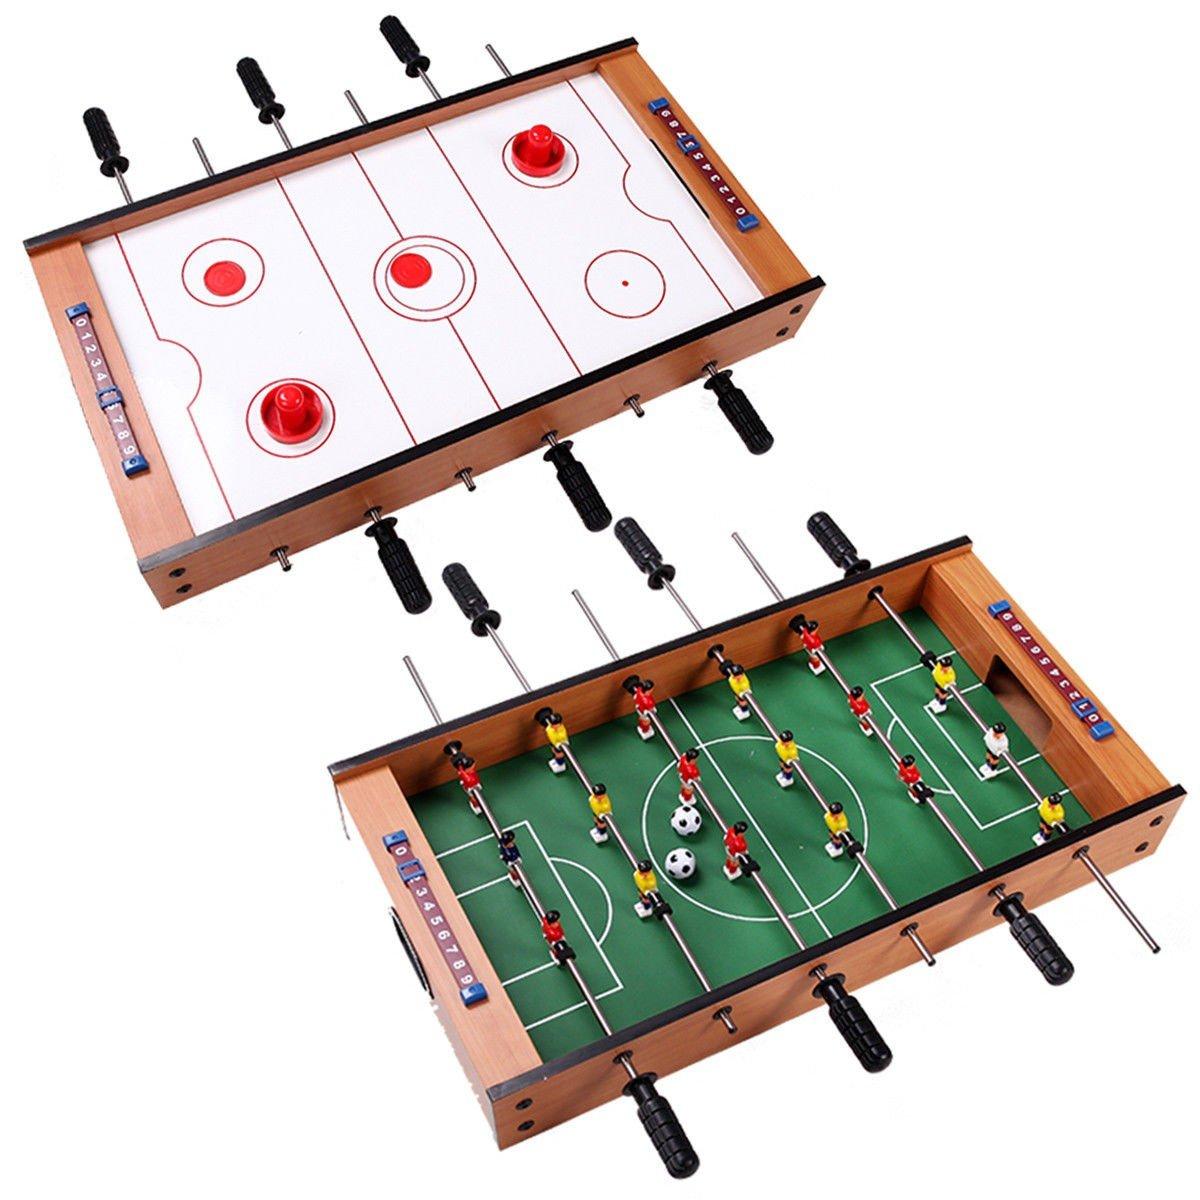 2-in-1 Indoor/Outdoor Air Hockey Foosball Game Table by Abbeydh